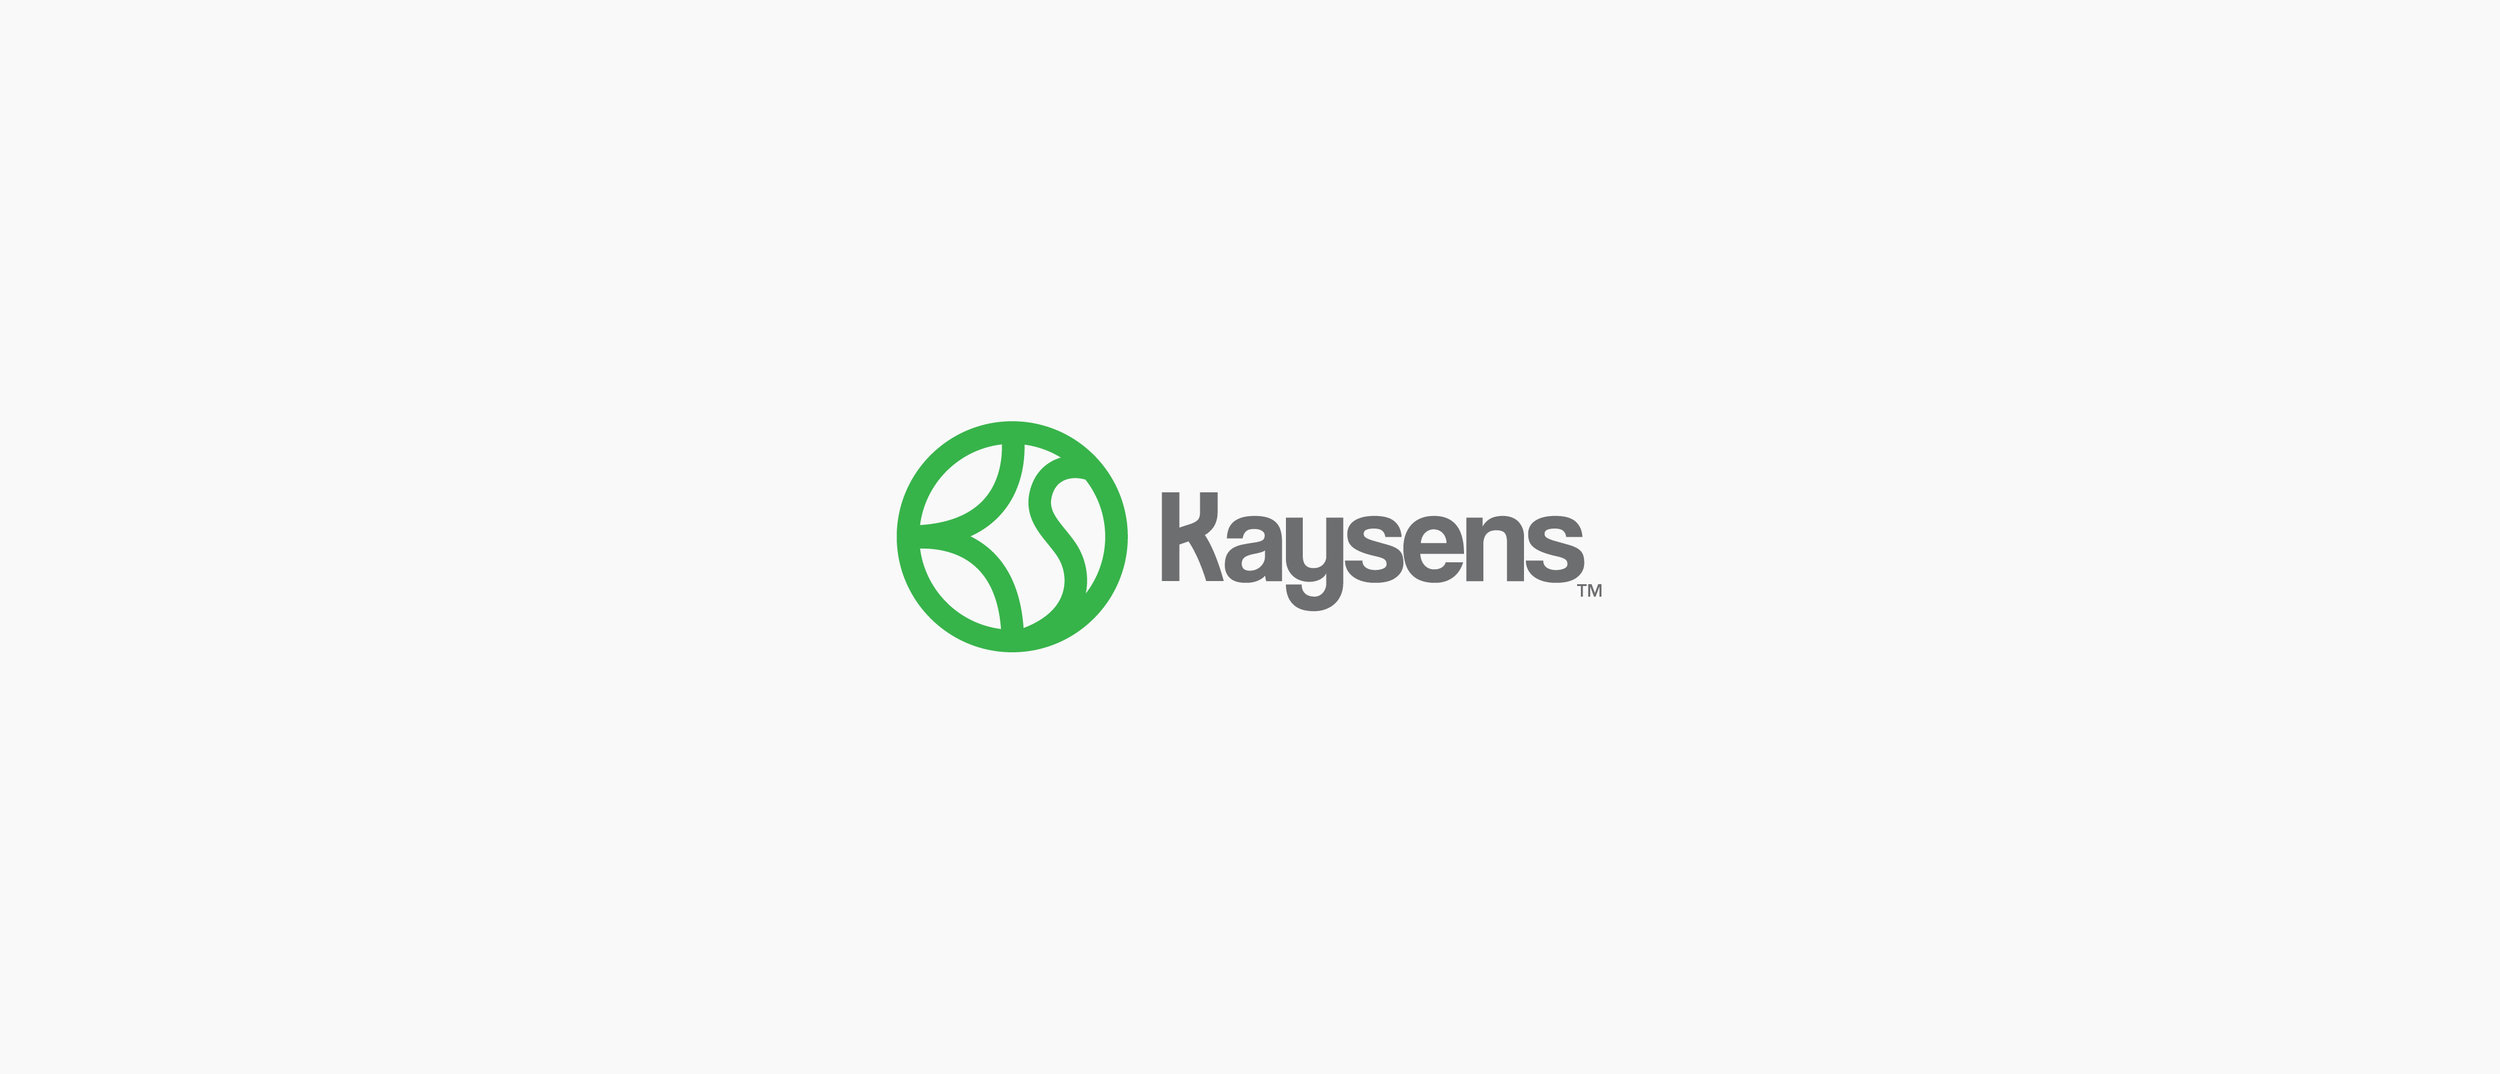 Kaysens | Logistics Company | 2017